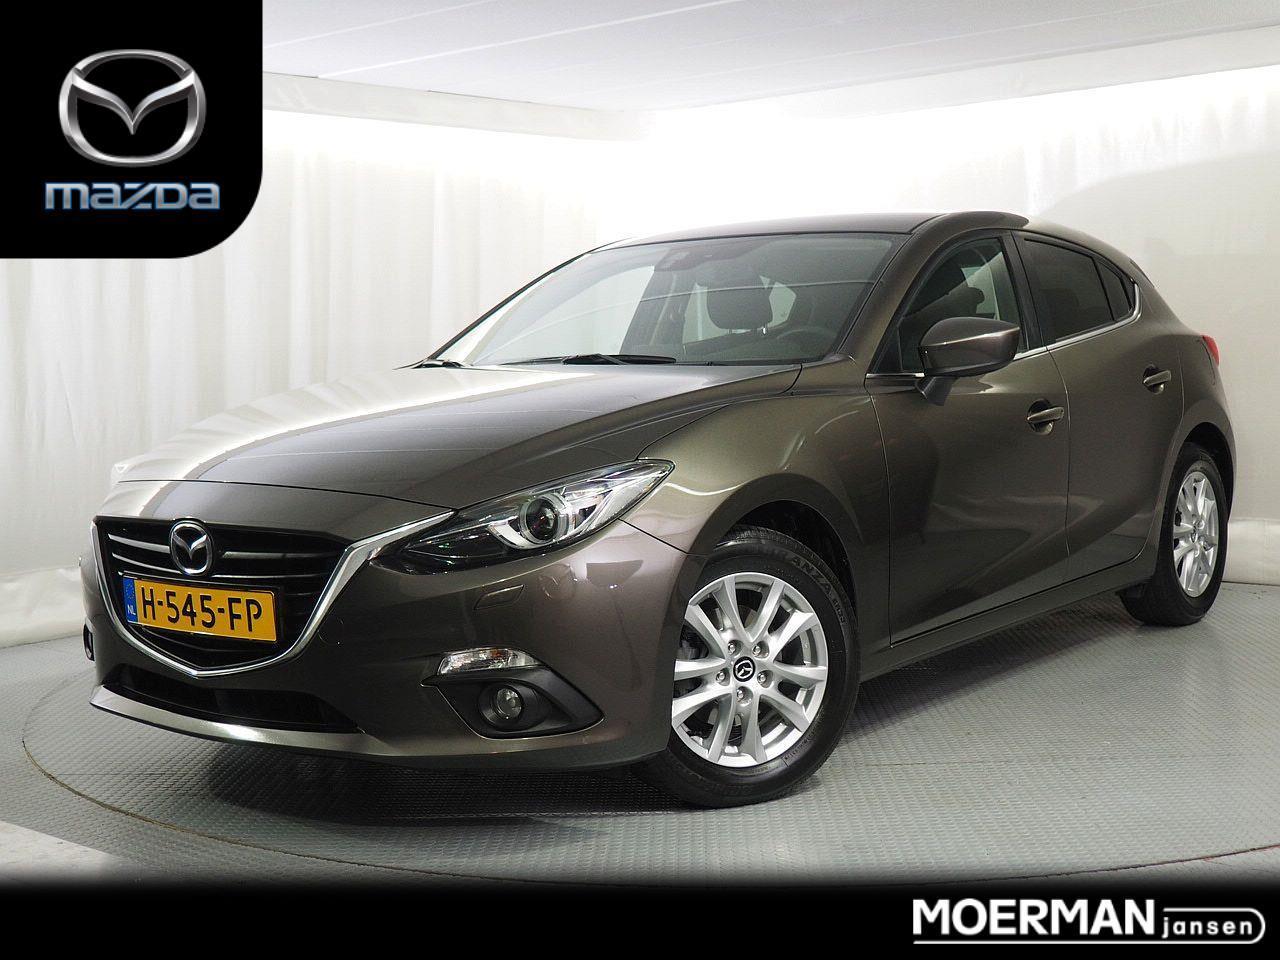 Mazda 3 1.5 ts+ / 96.000km / dealeronderhouden / 5-drs / navigatie / climate&cruise control  /